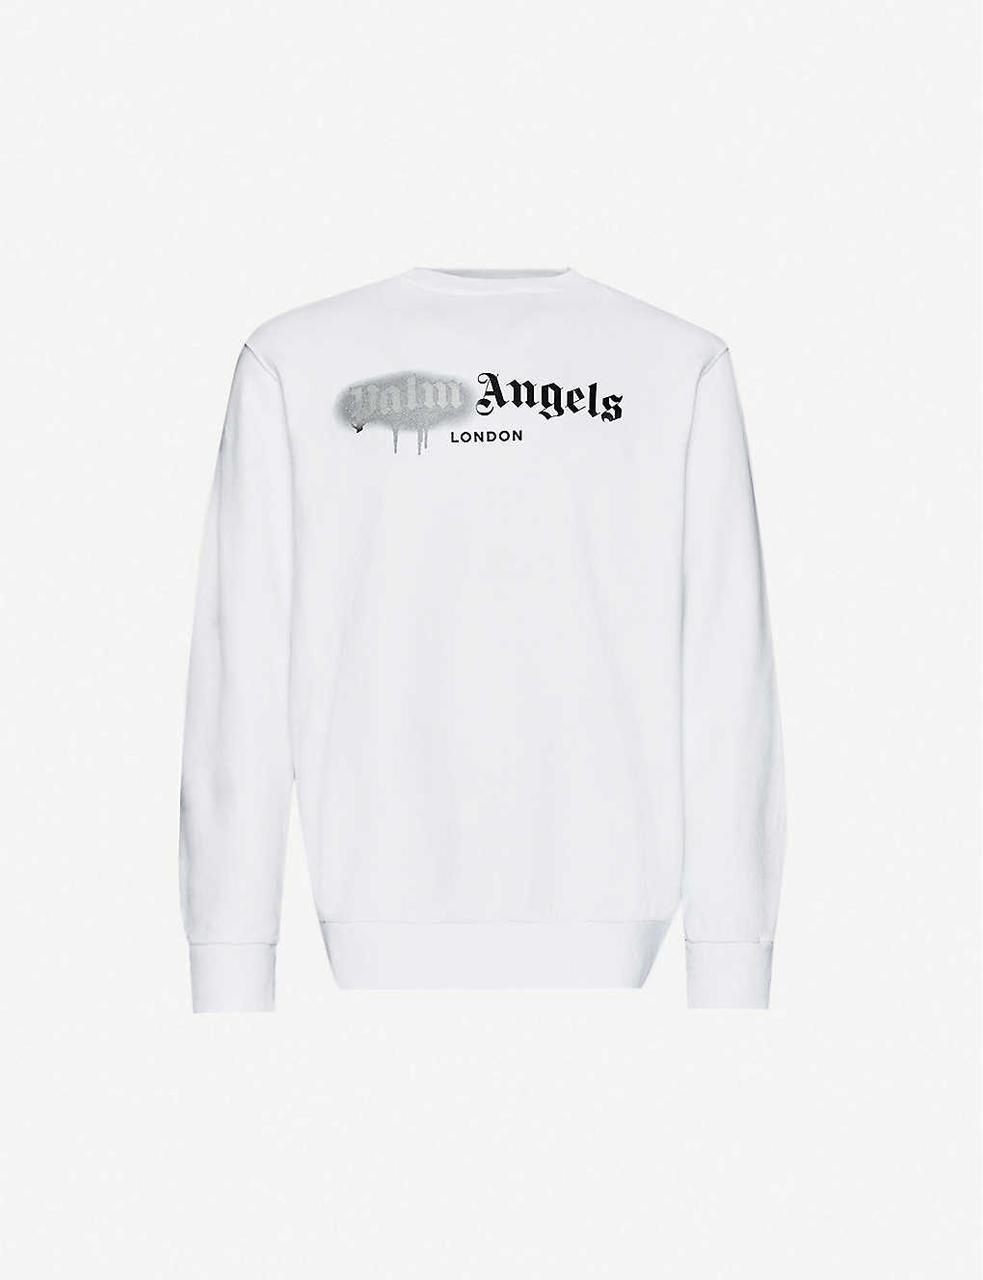 Свитшот белый Palm Angels grey spray • кофта Палм Анжелс